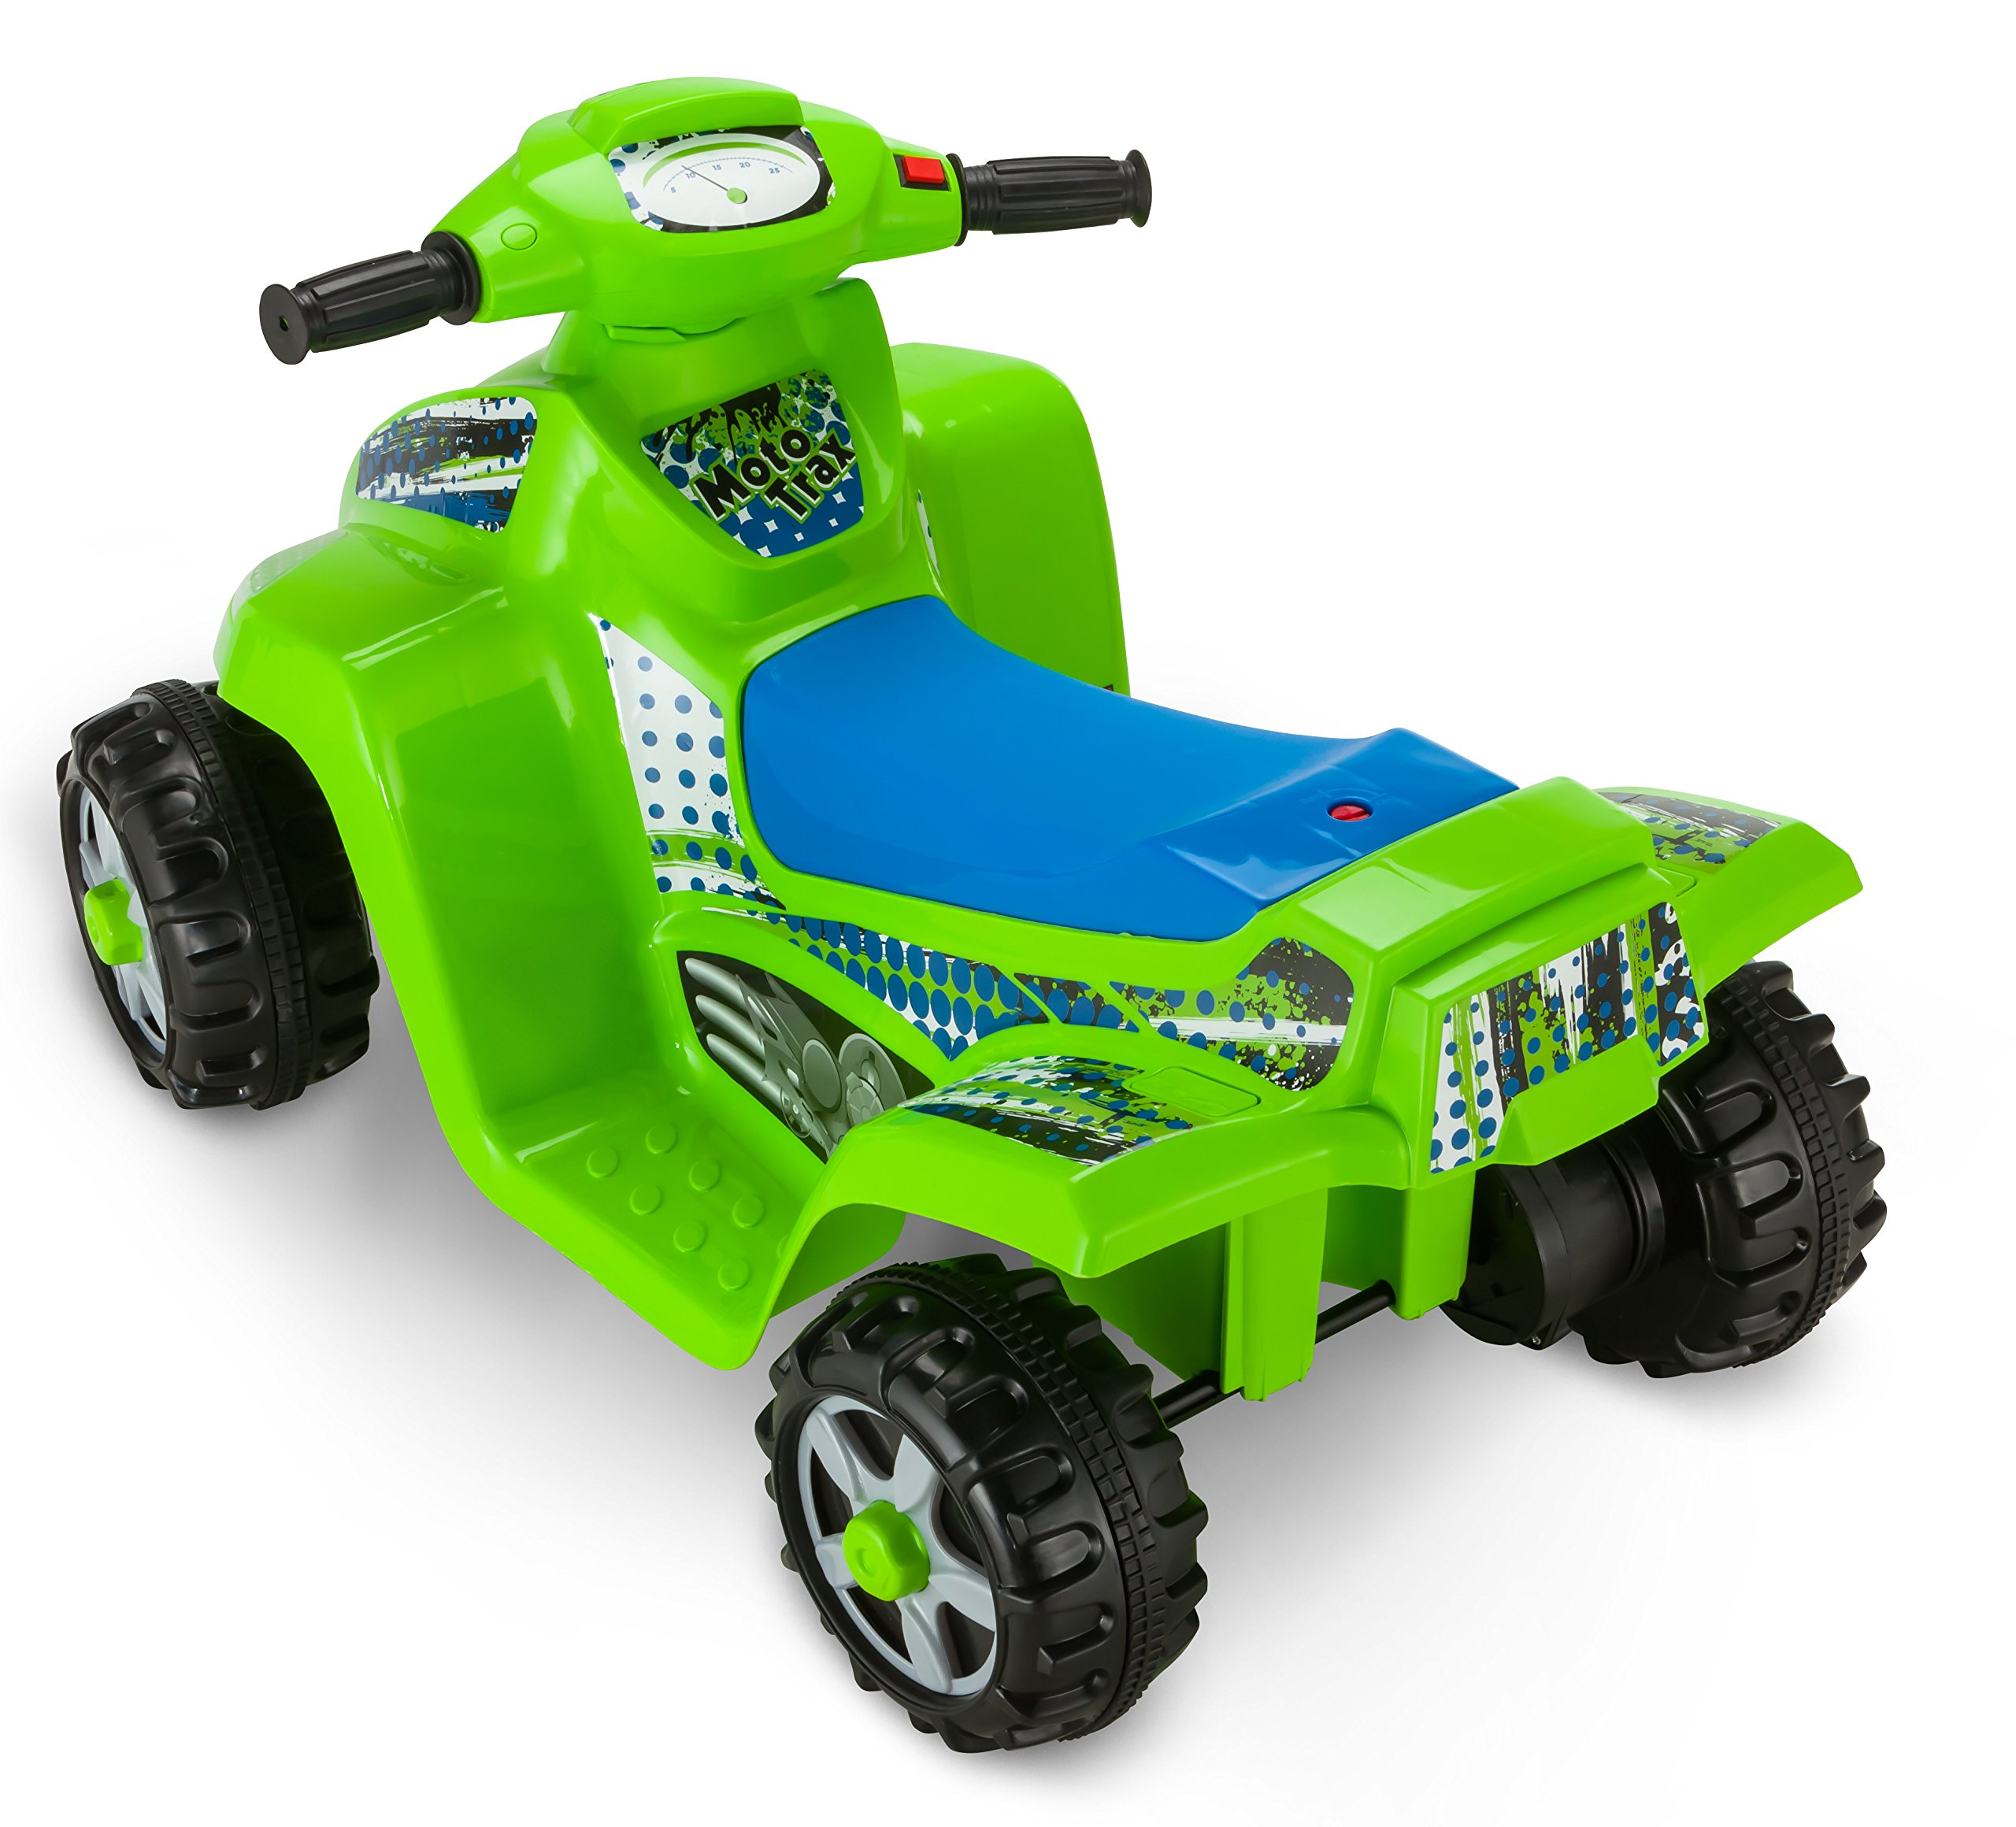 Kid Trax Moto Trax 6V Toddler Quad Ride On, Green by Kid Trax (Image #2)